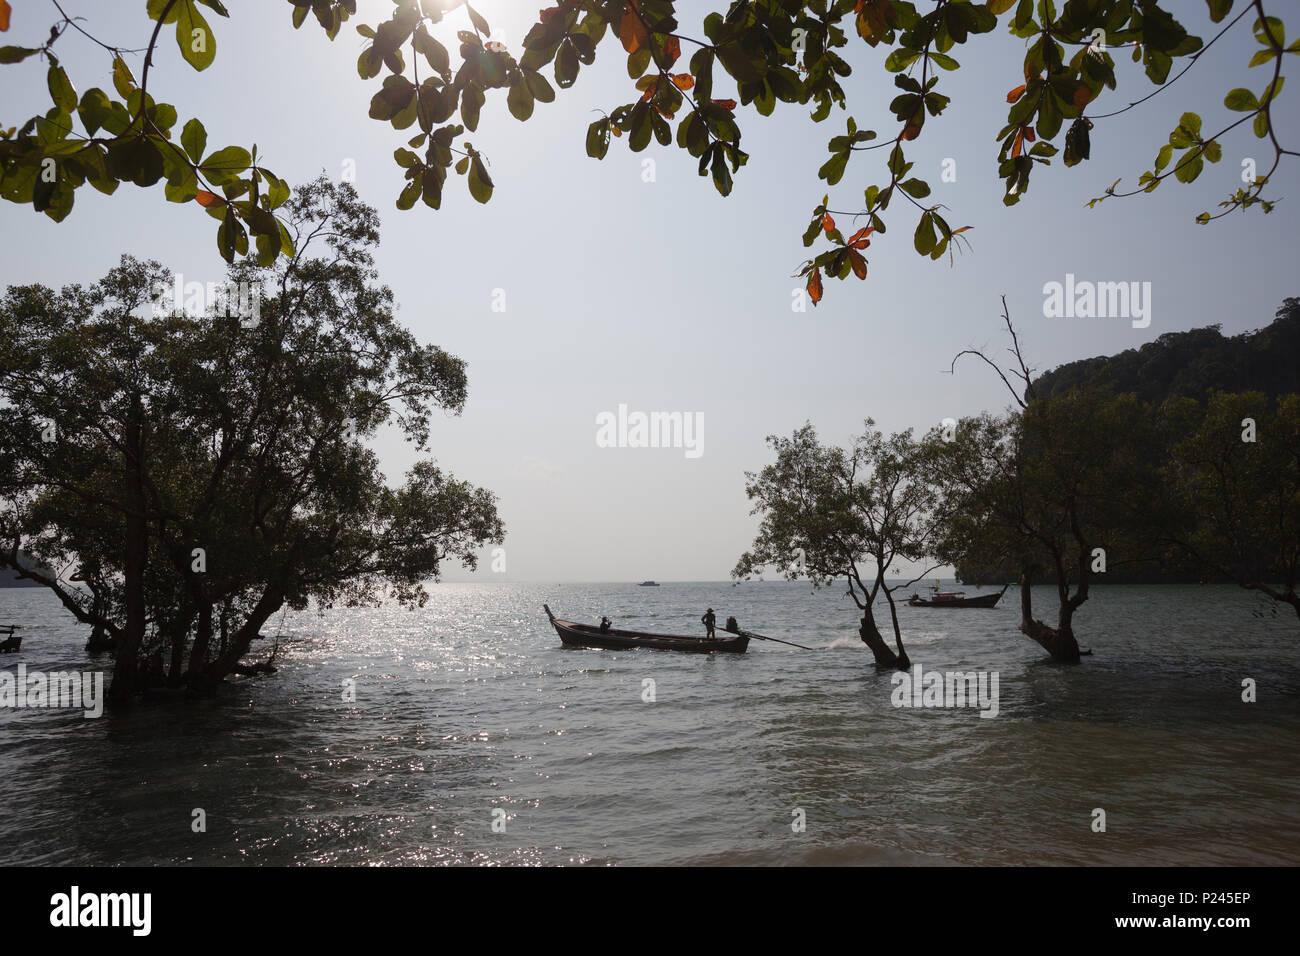 Coast with mangroves. Twilight. Krabi. Thailand - Stock Image